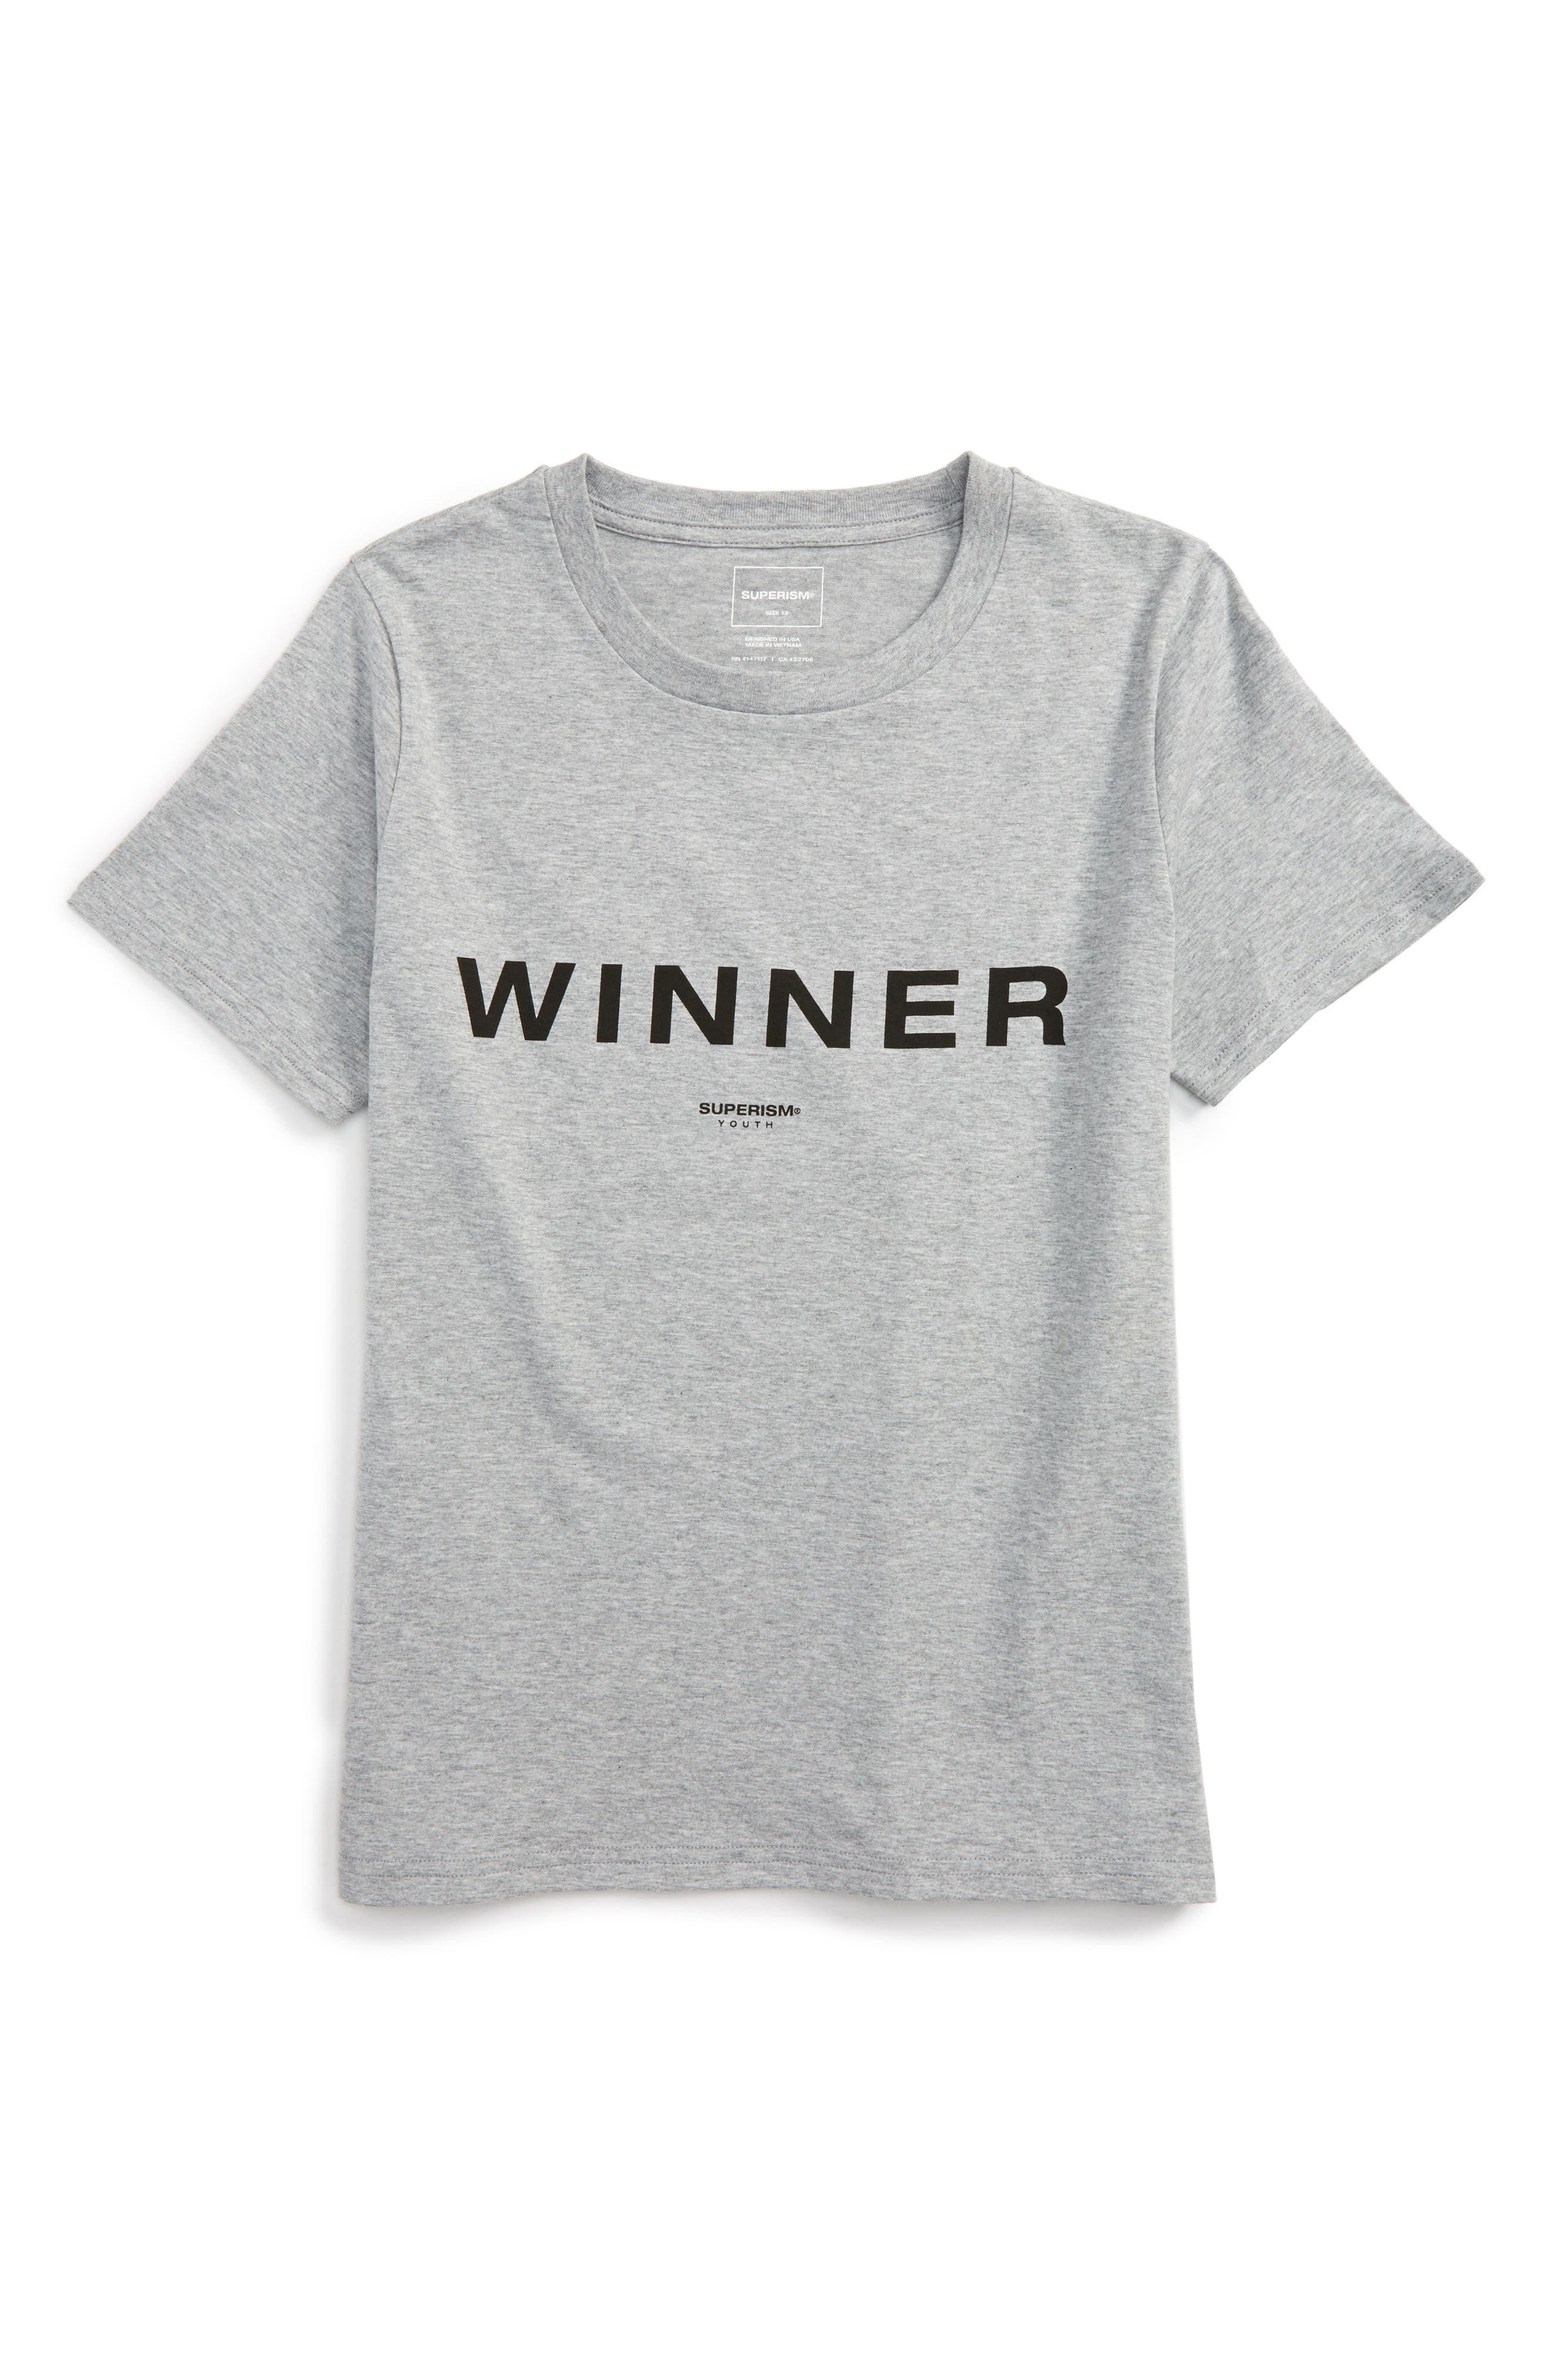 Winner T-Shirt,                         Main,                         color, Grey Heather